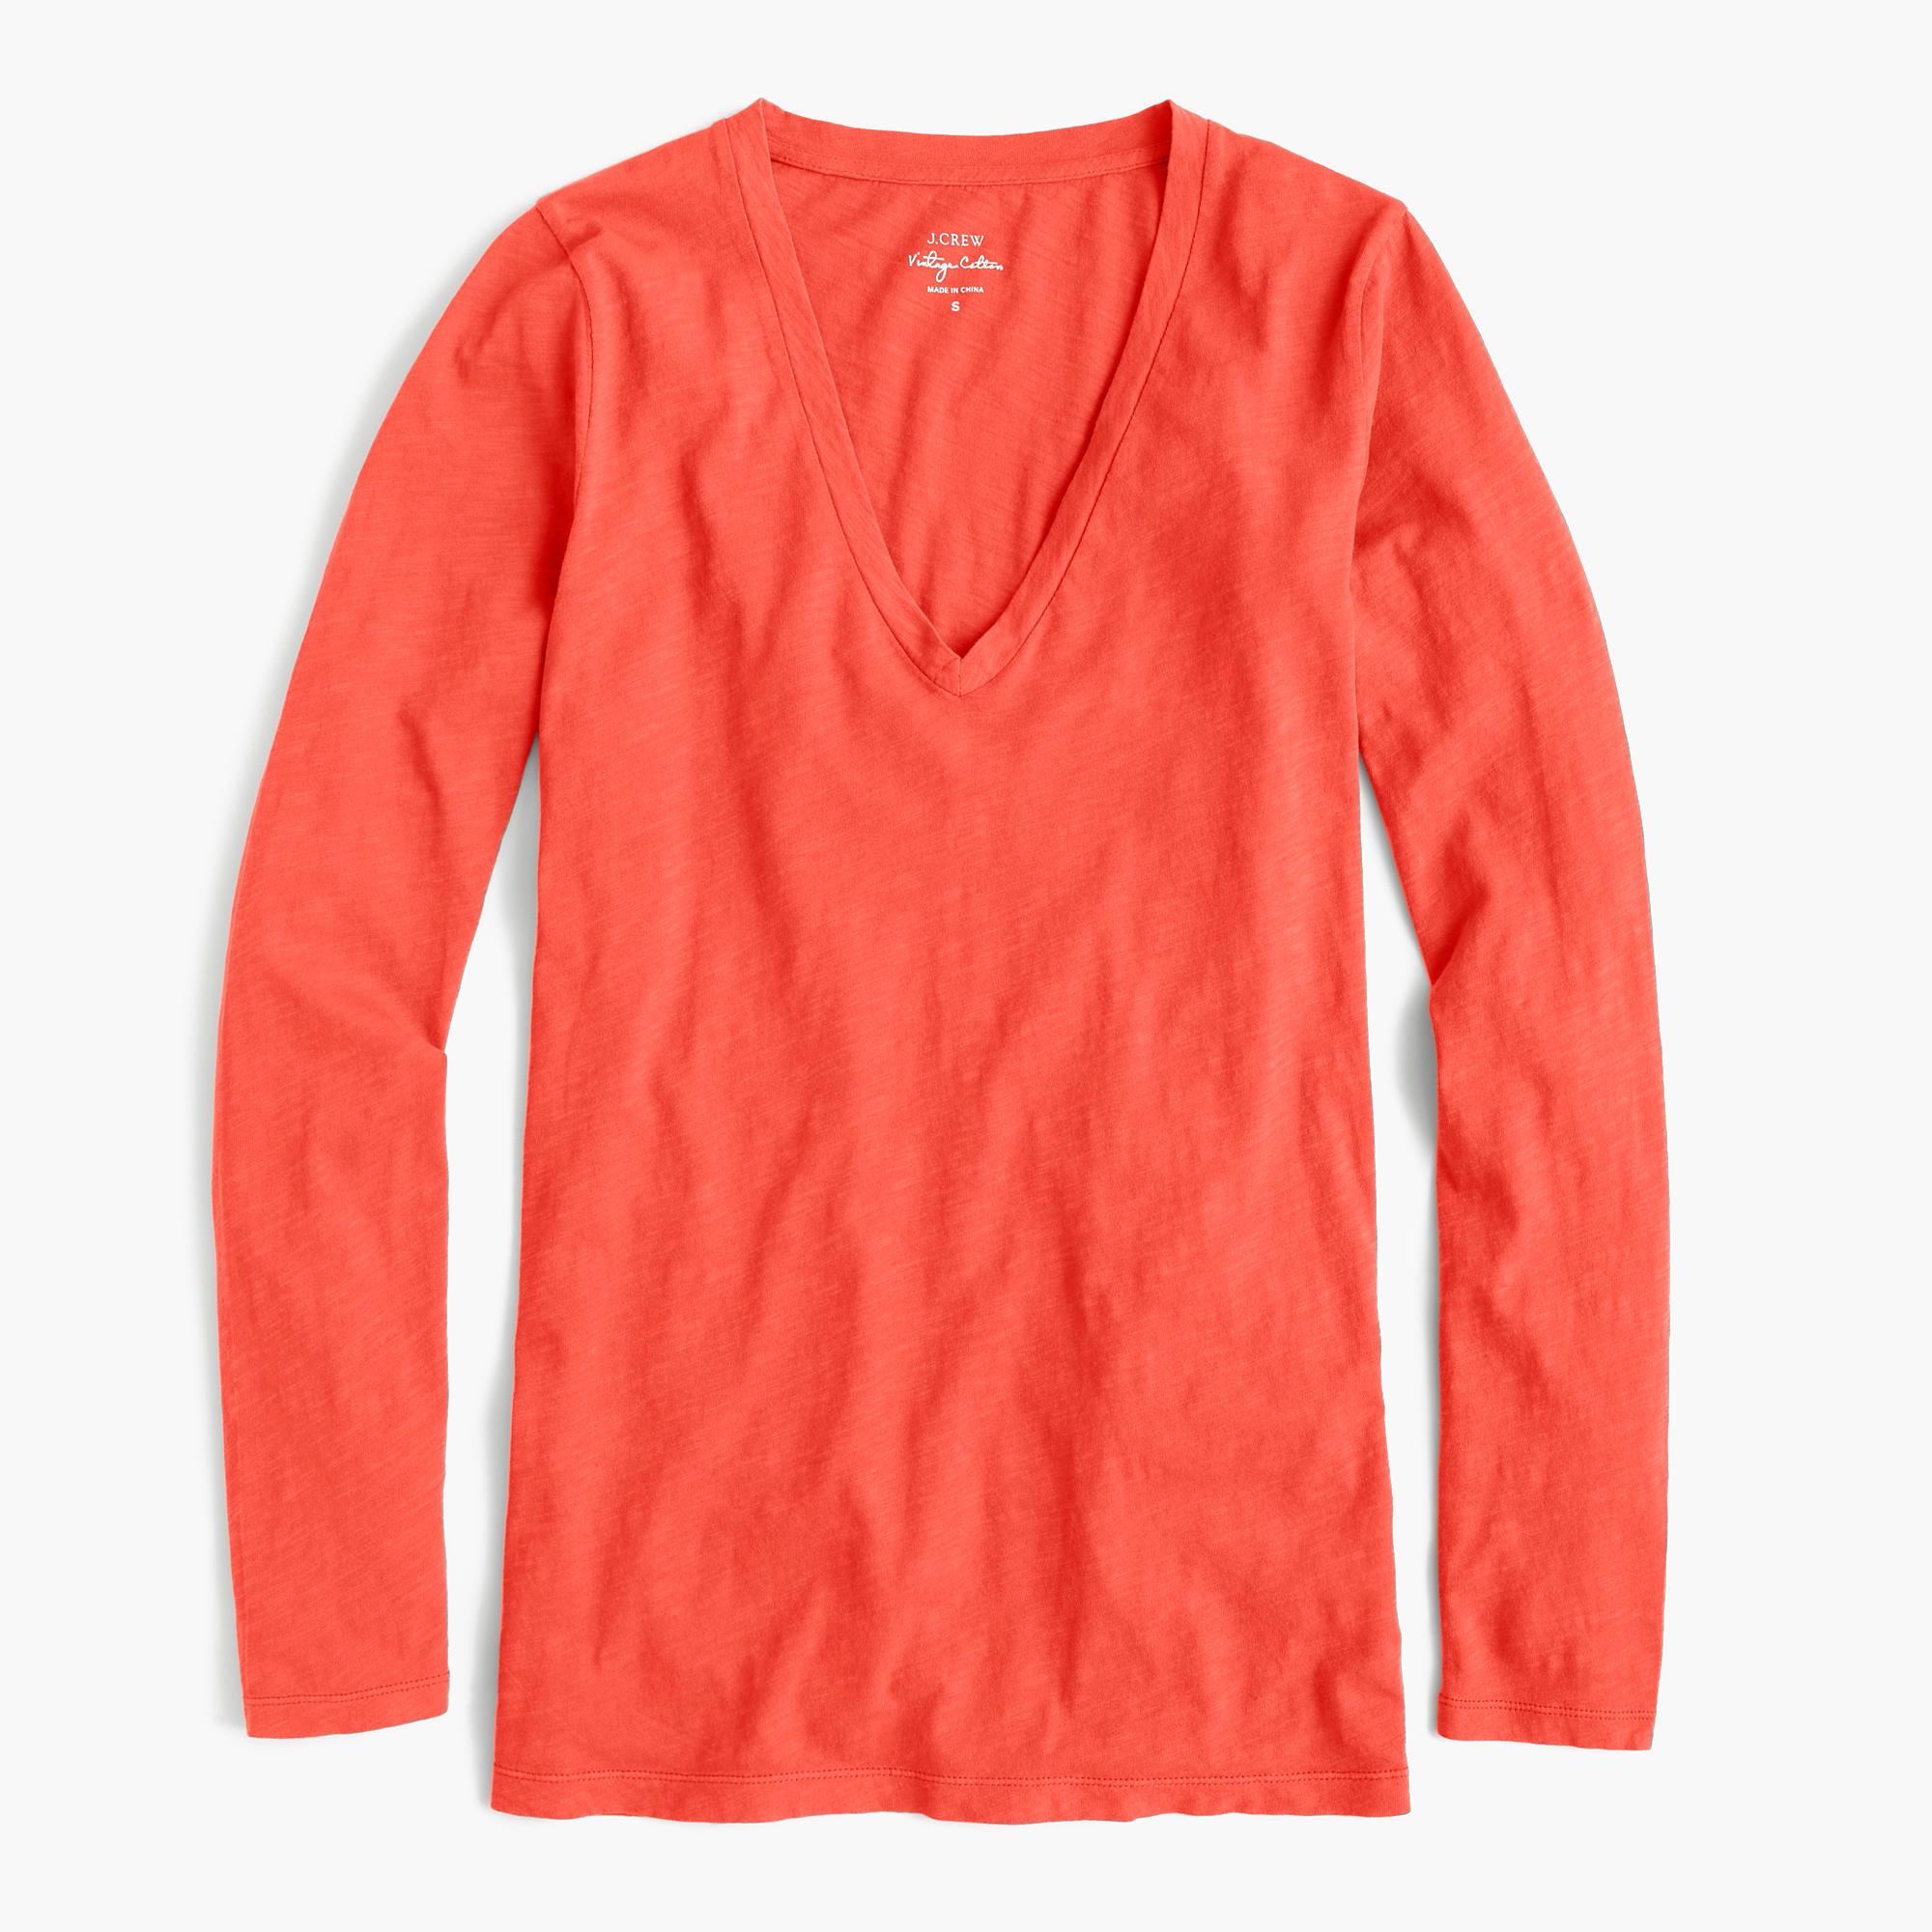 Vintage cotton long sleeve v neck t shirt in orange for Cotton long sleeve v neck t shirts